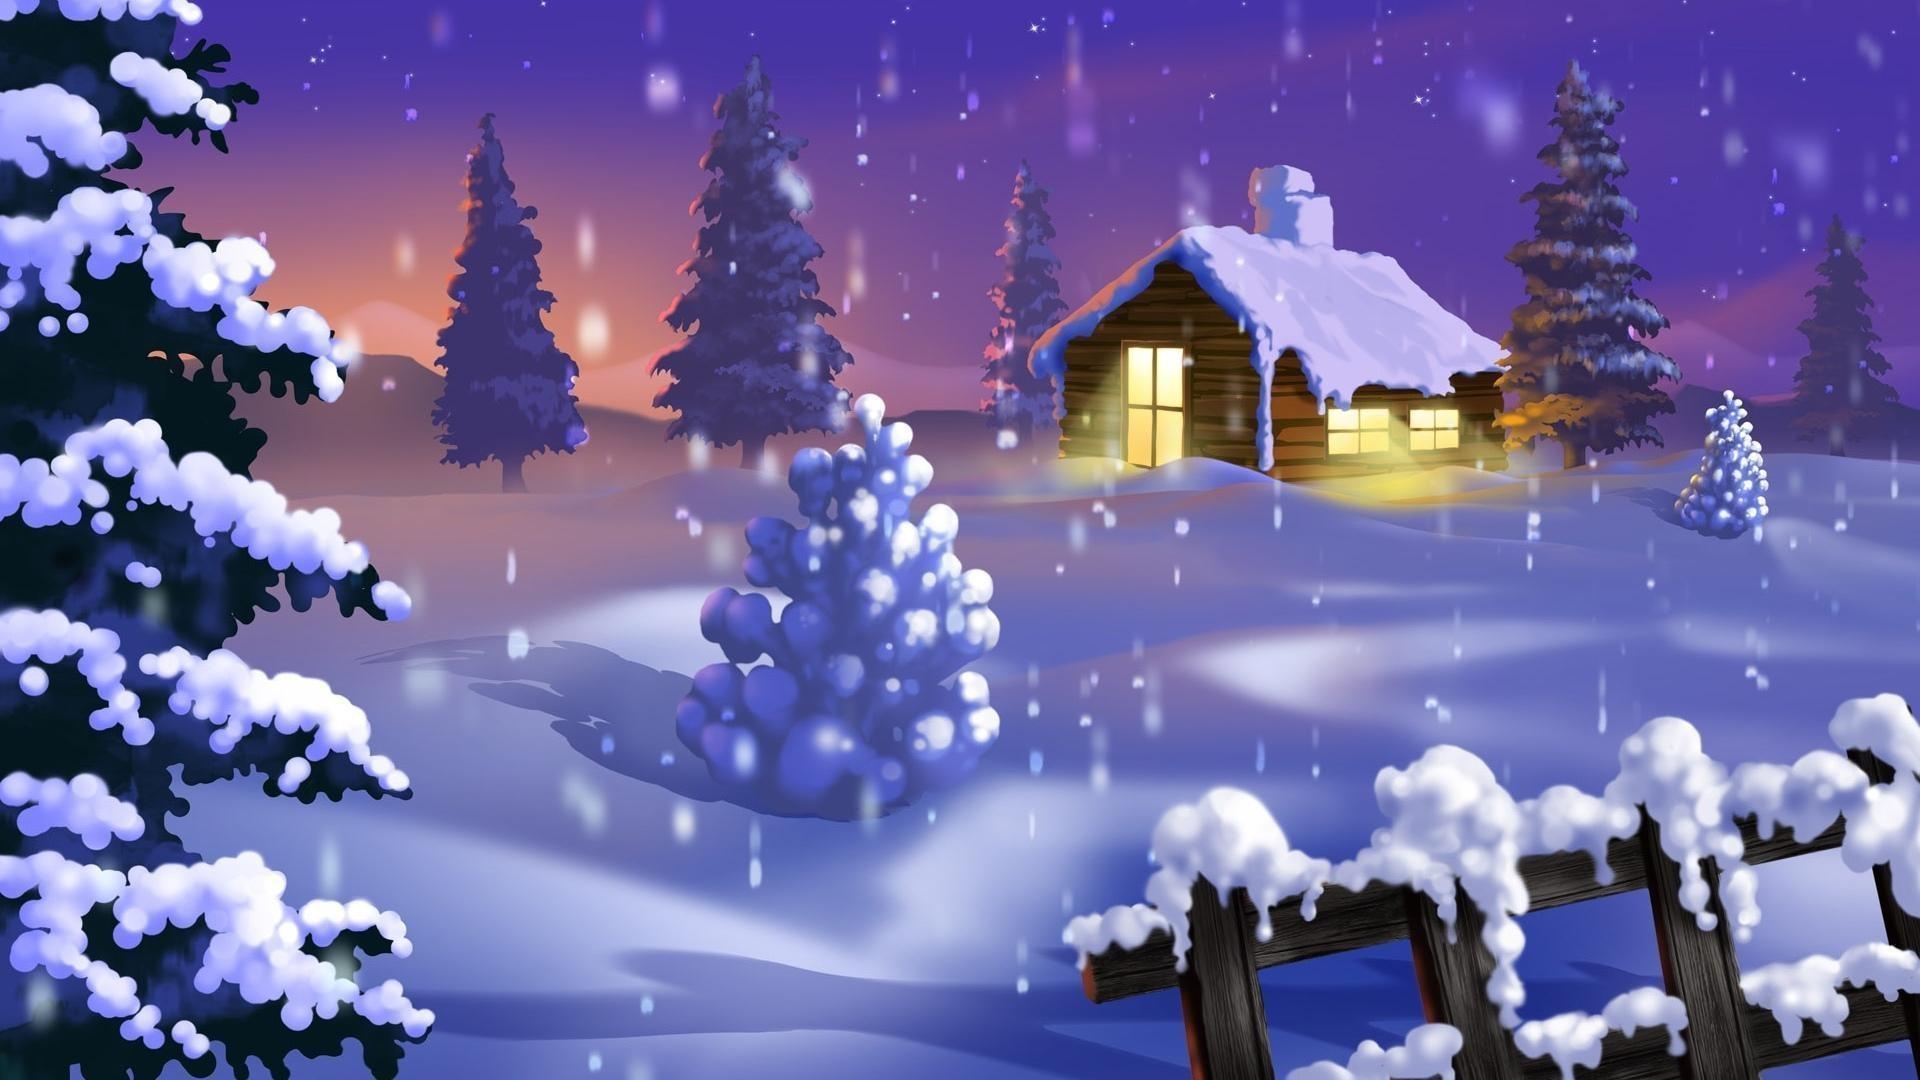 Xmas Stuff For > Beautiful Christmas Wallpapers Hd